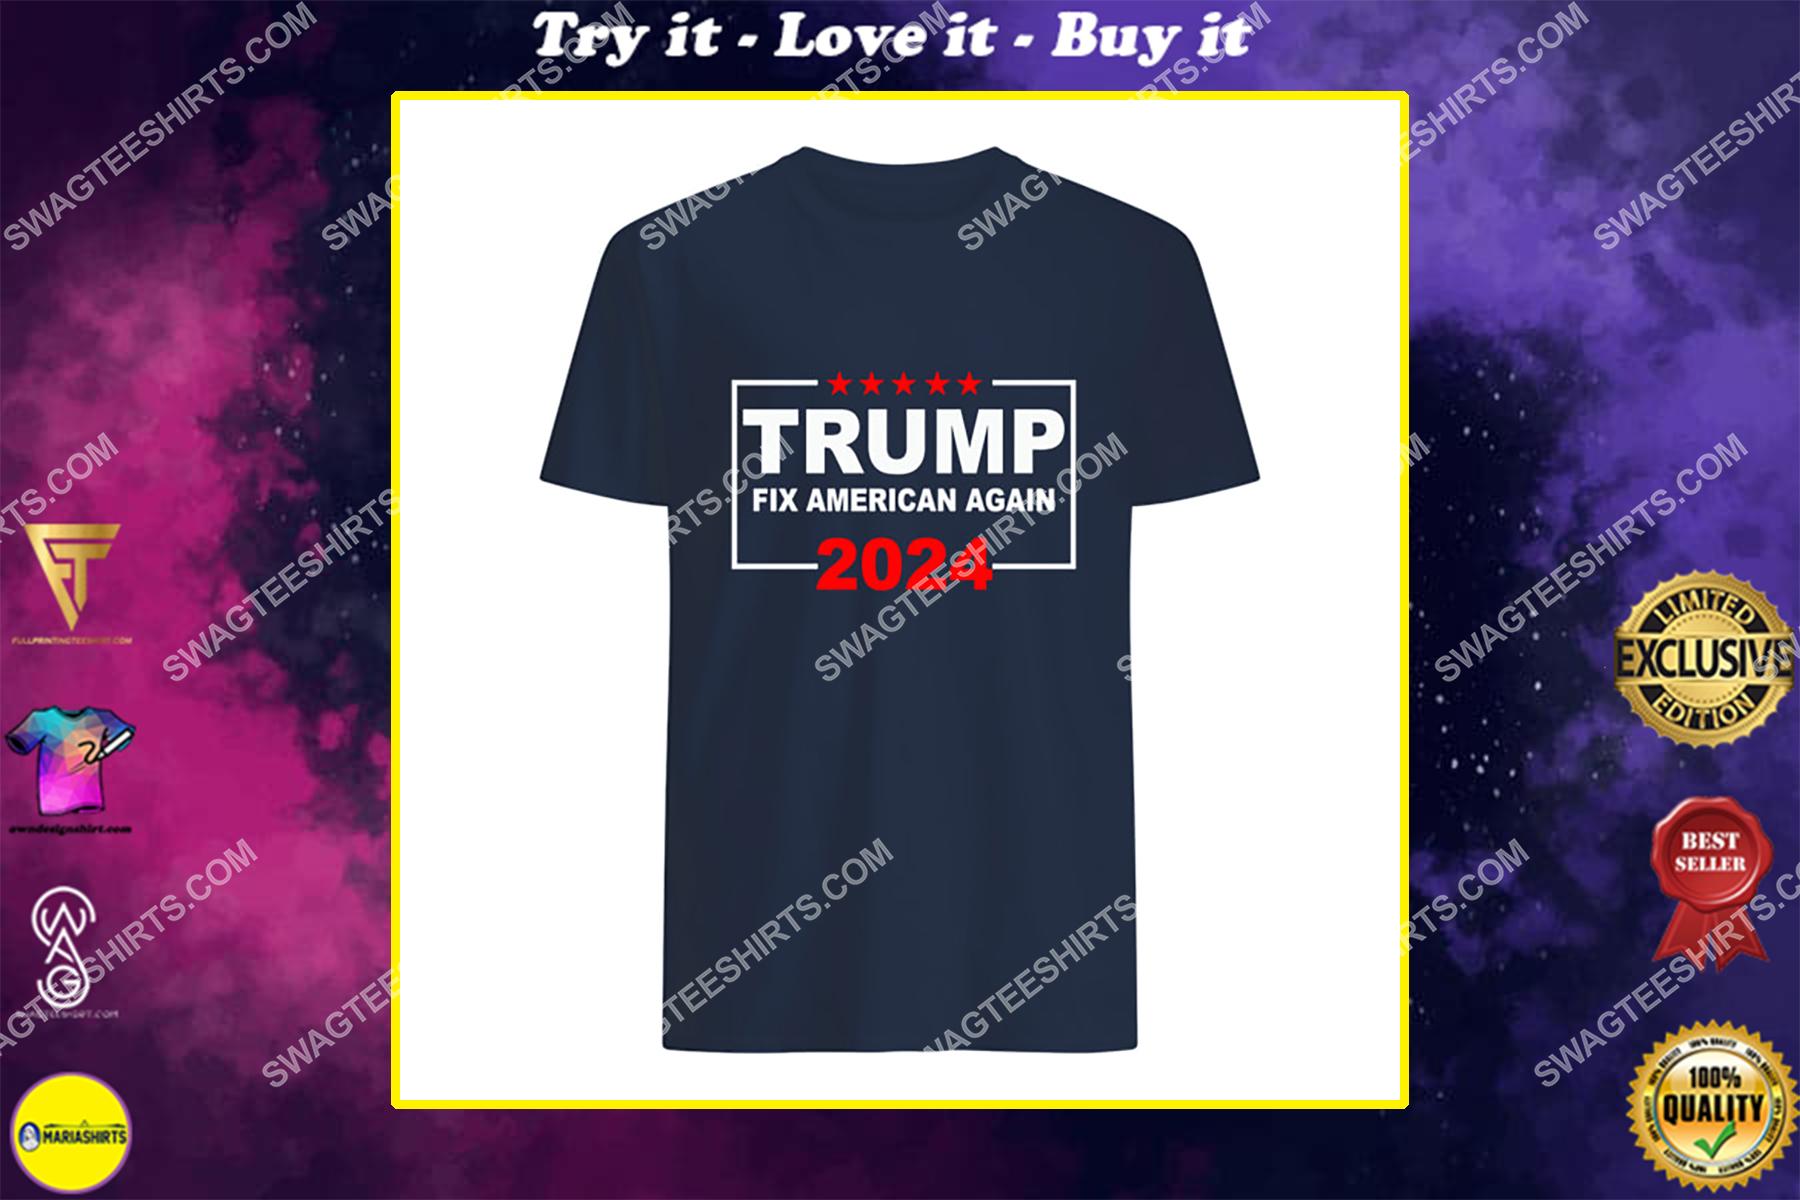 donald trump fix america again fight for democracy politics shirt